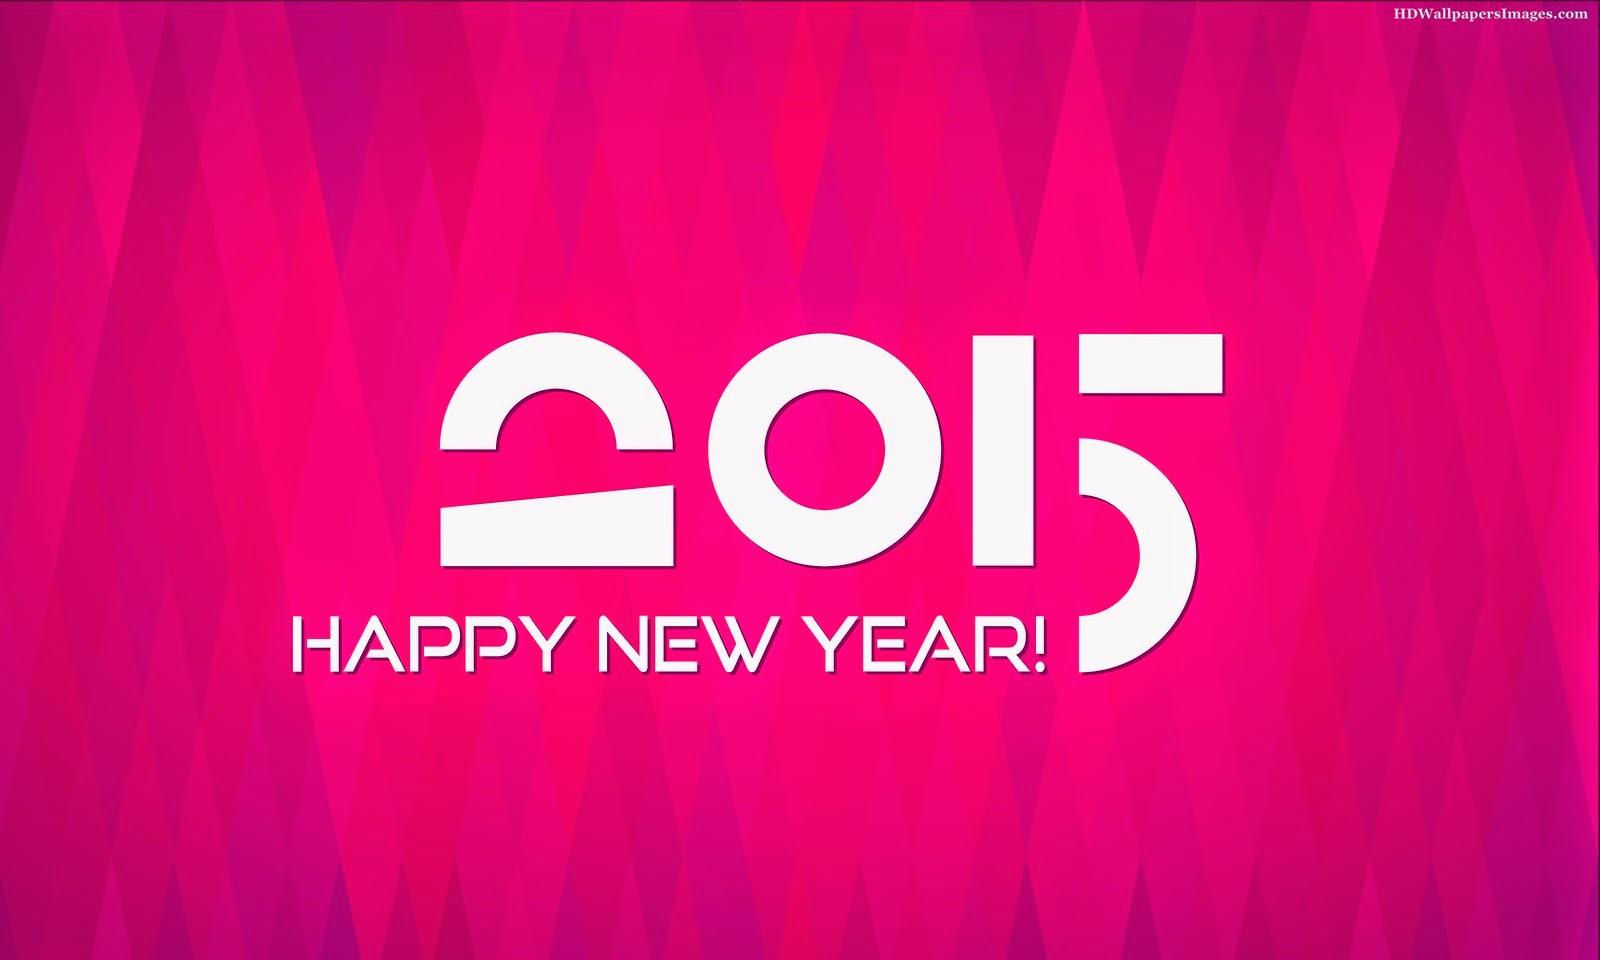 November 2014 Happy New Year 2015 Wallpaper